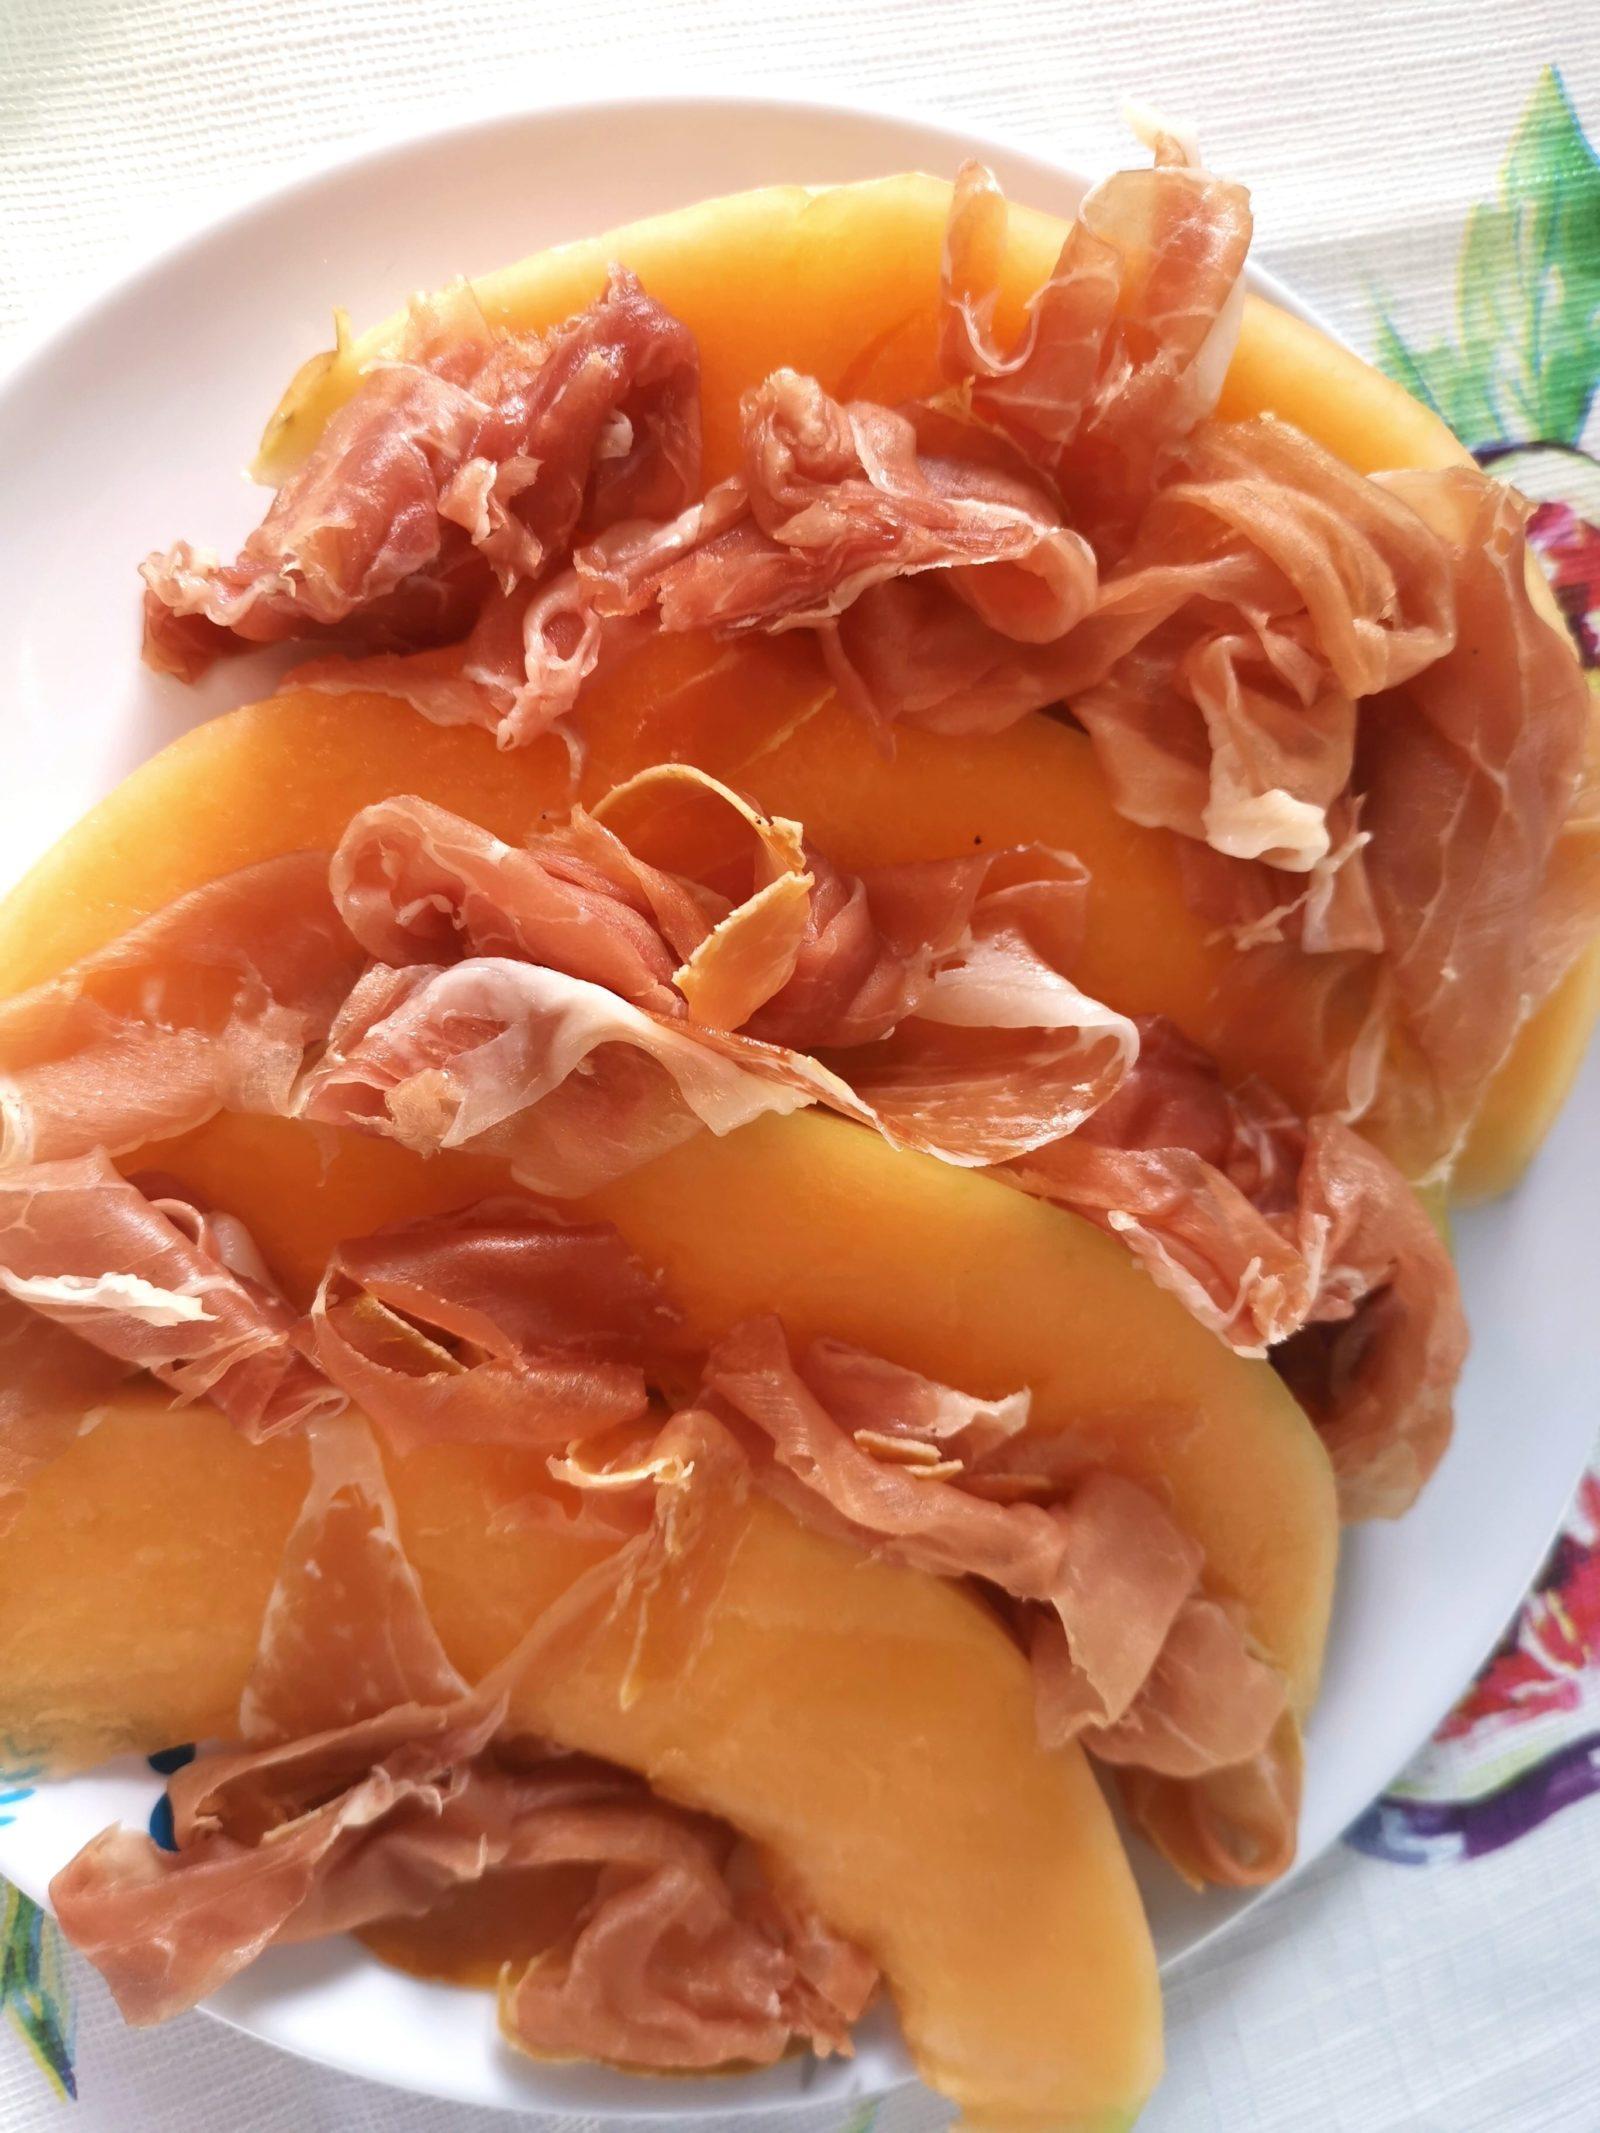 Parmaschinken mit Cantaloupe Melone